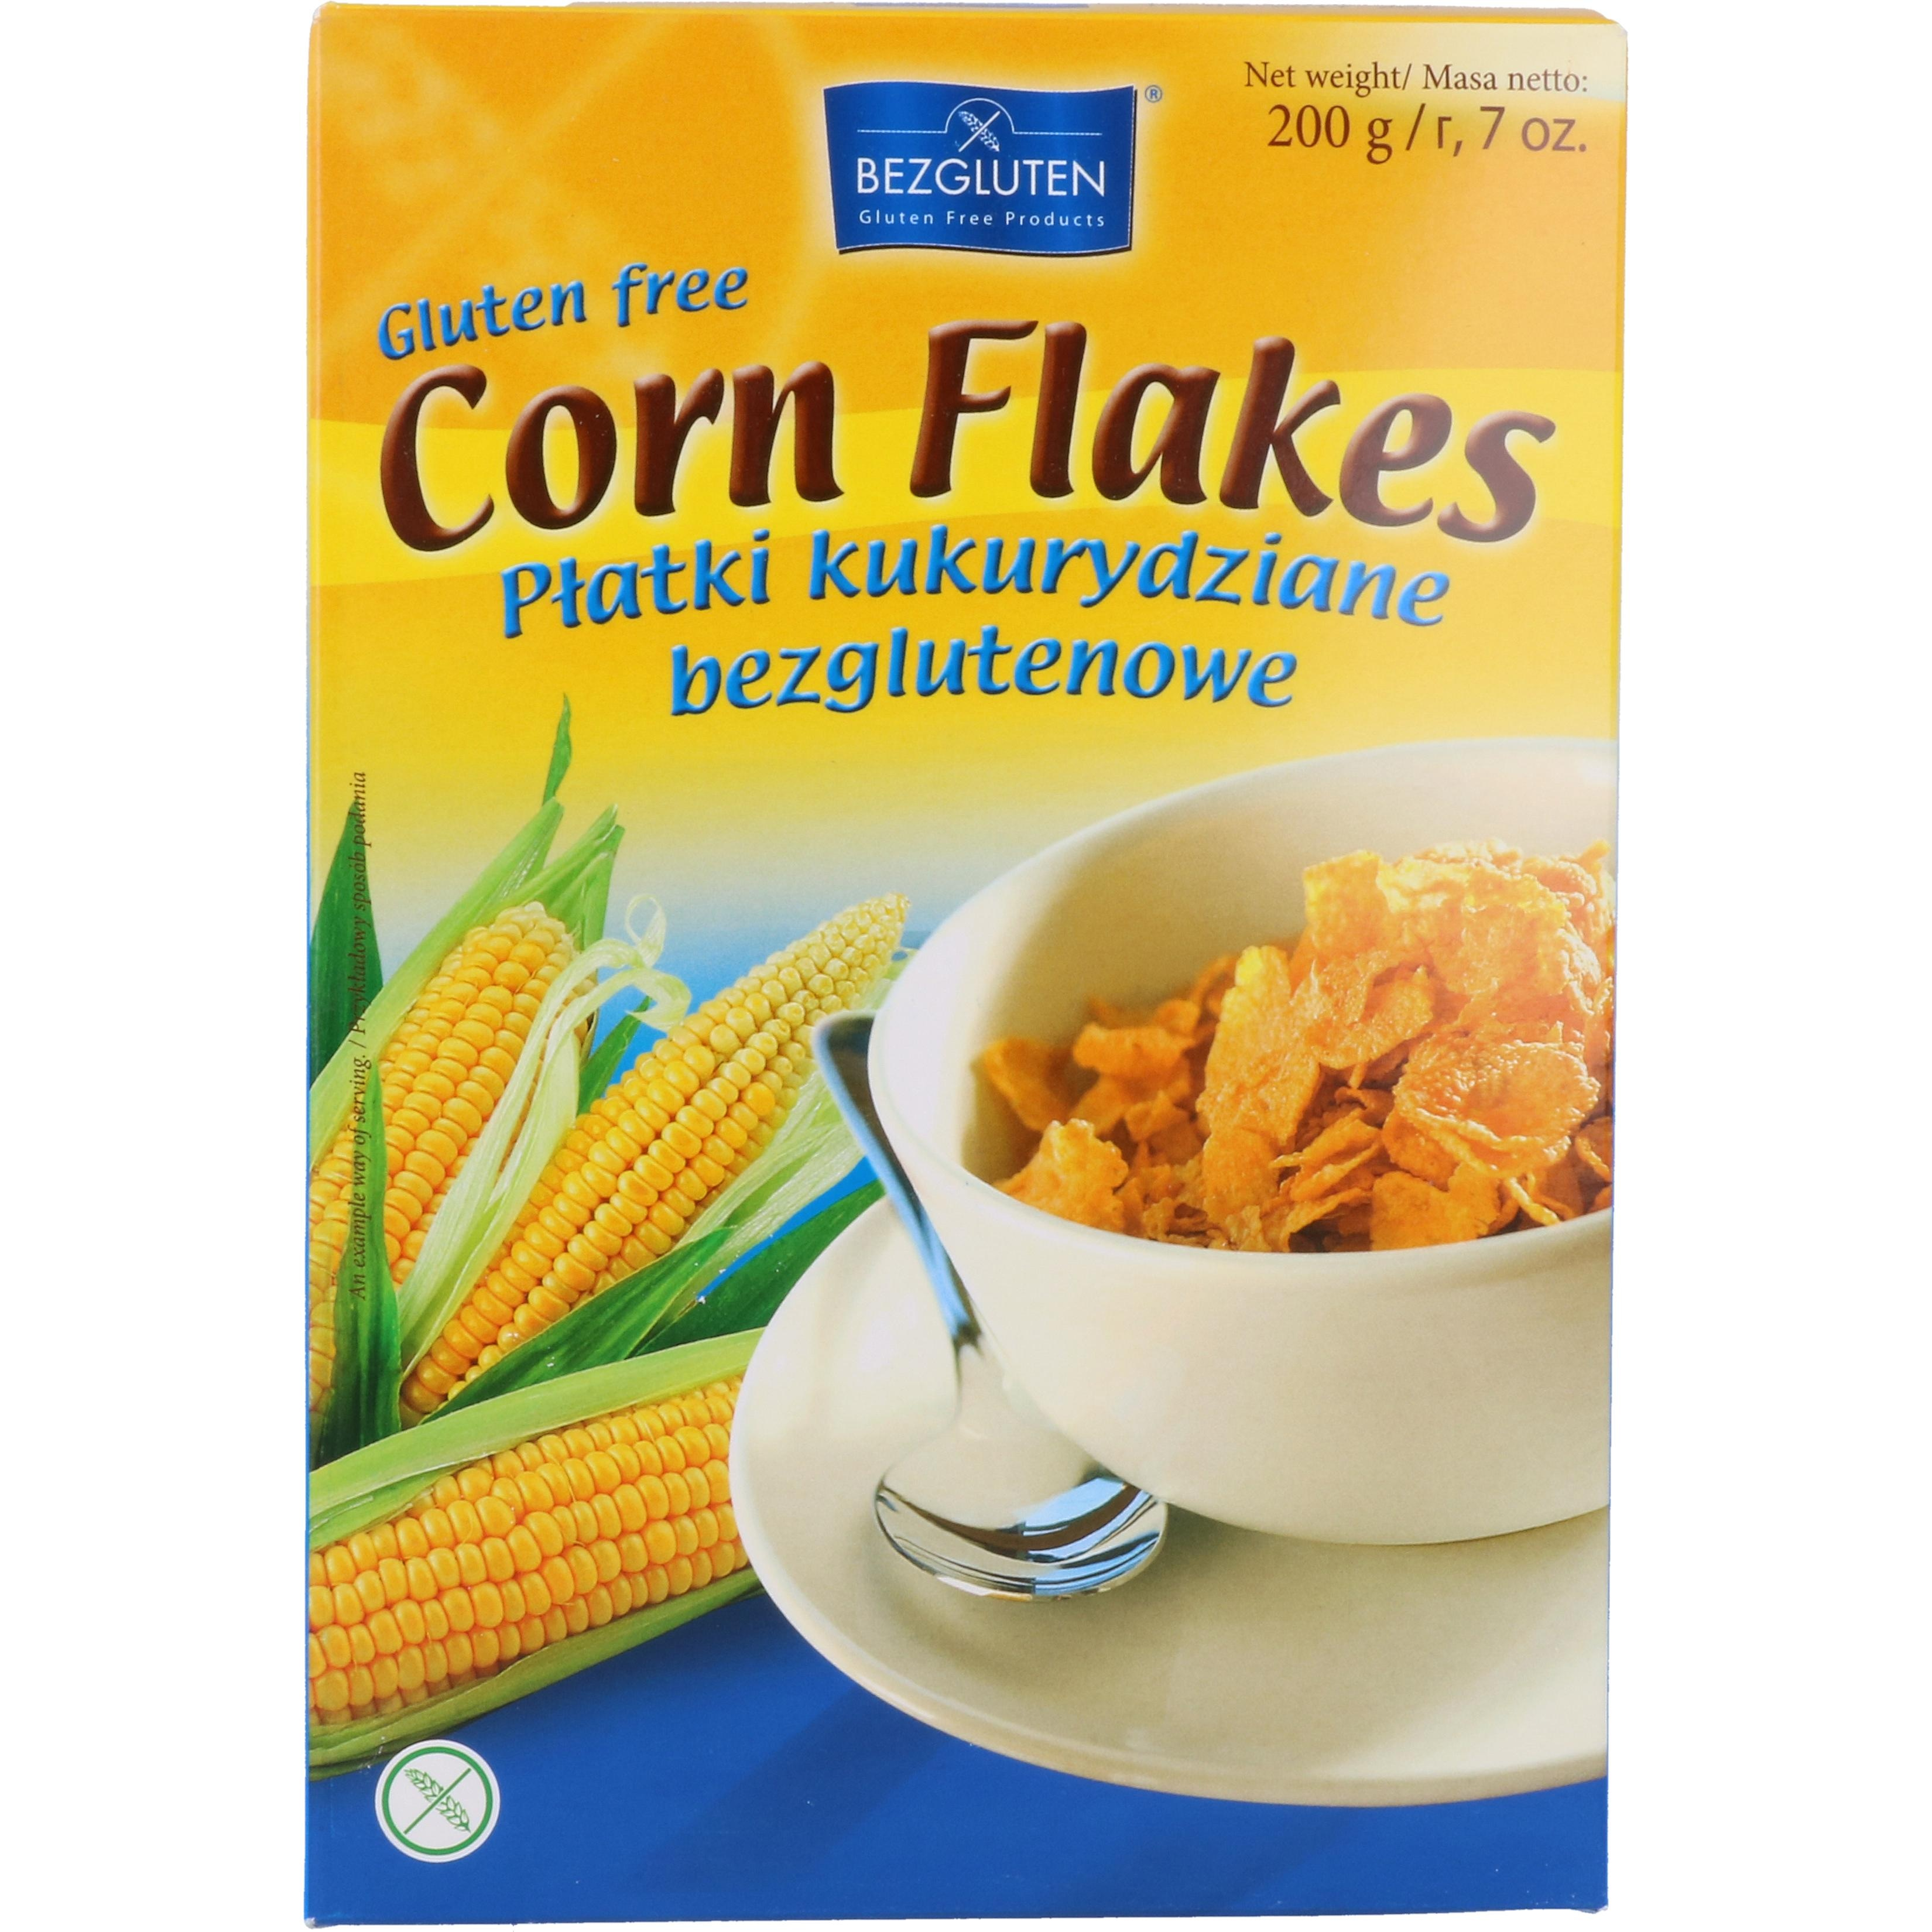 Bezgluten Corn Flakes 200g